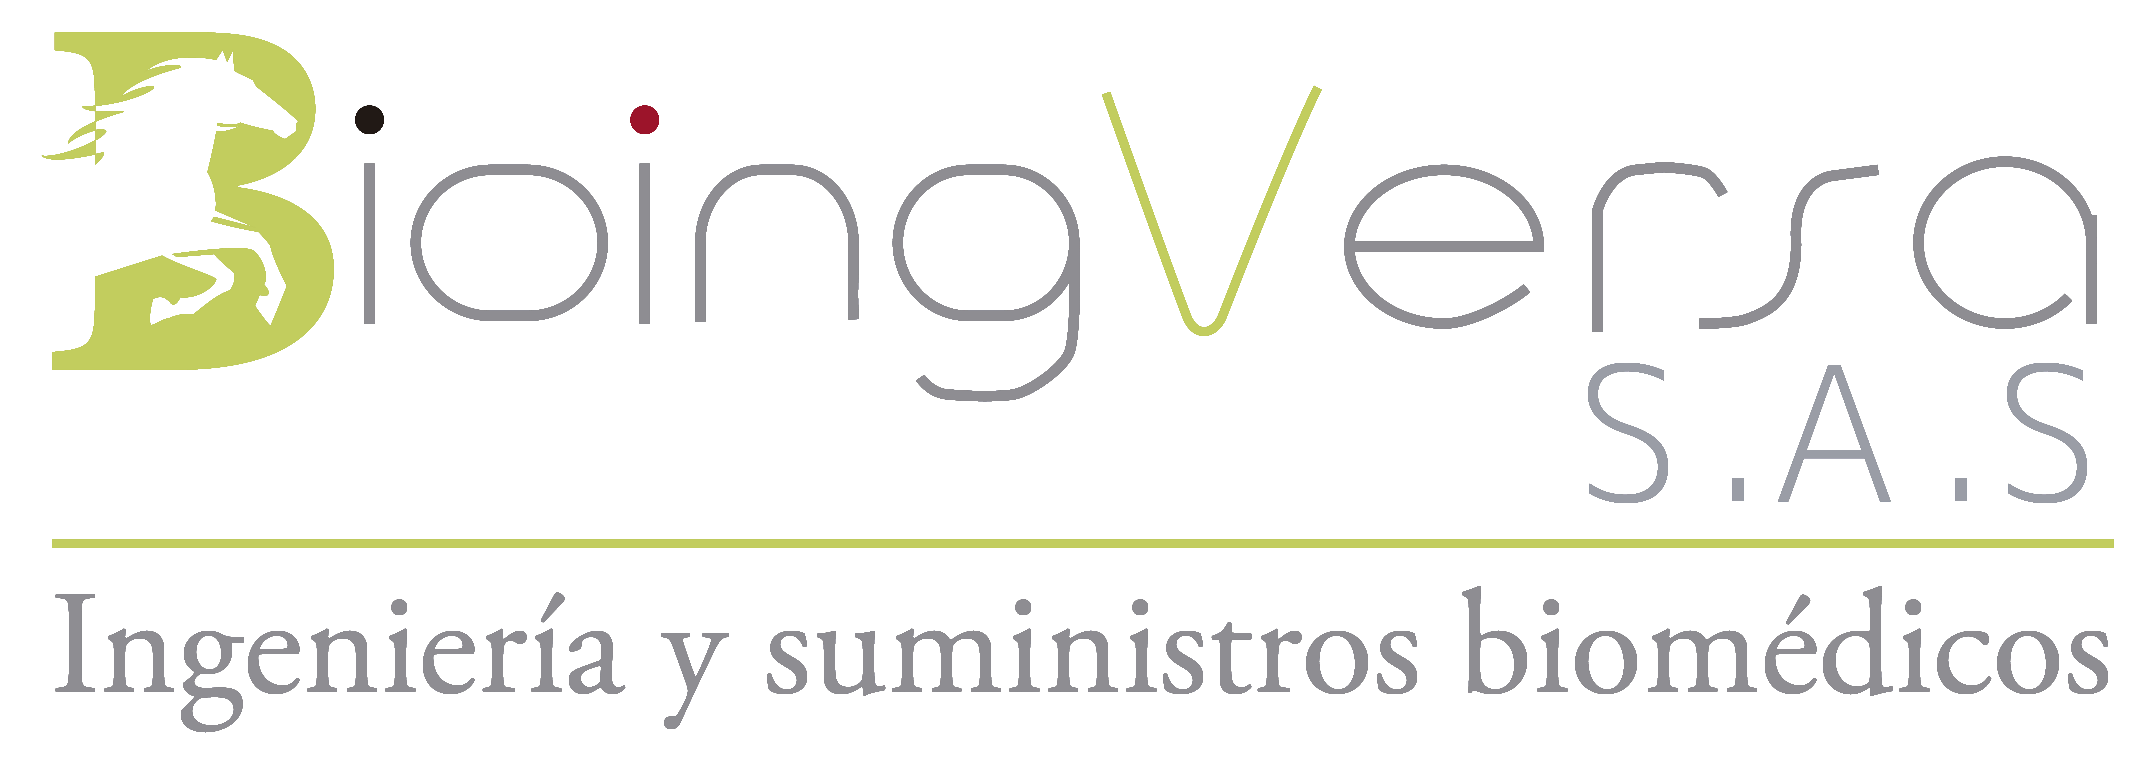 Bioingversa S.A.S